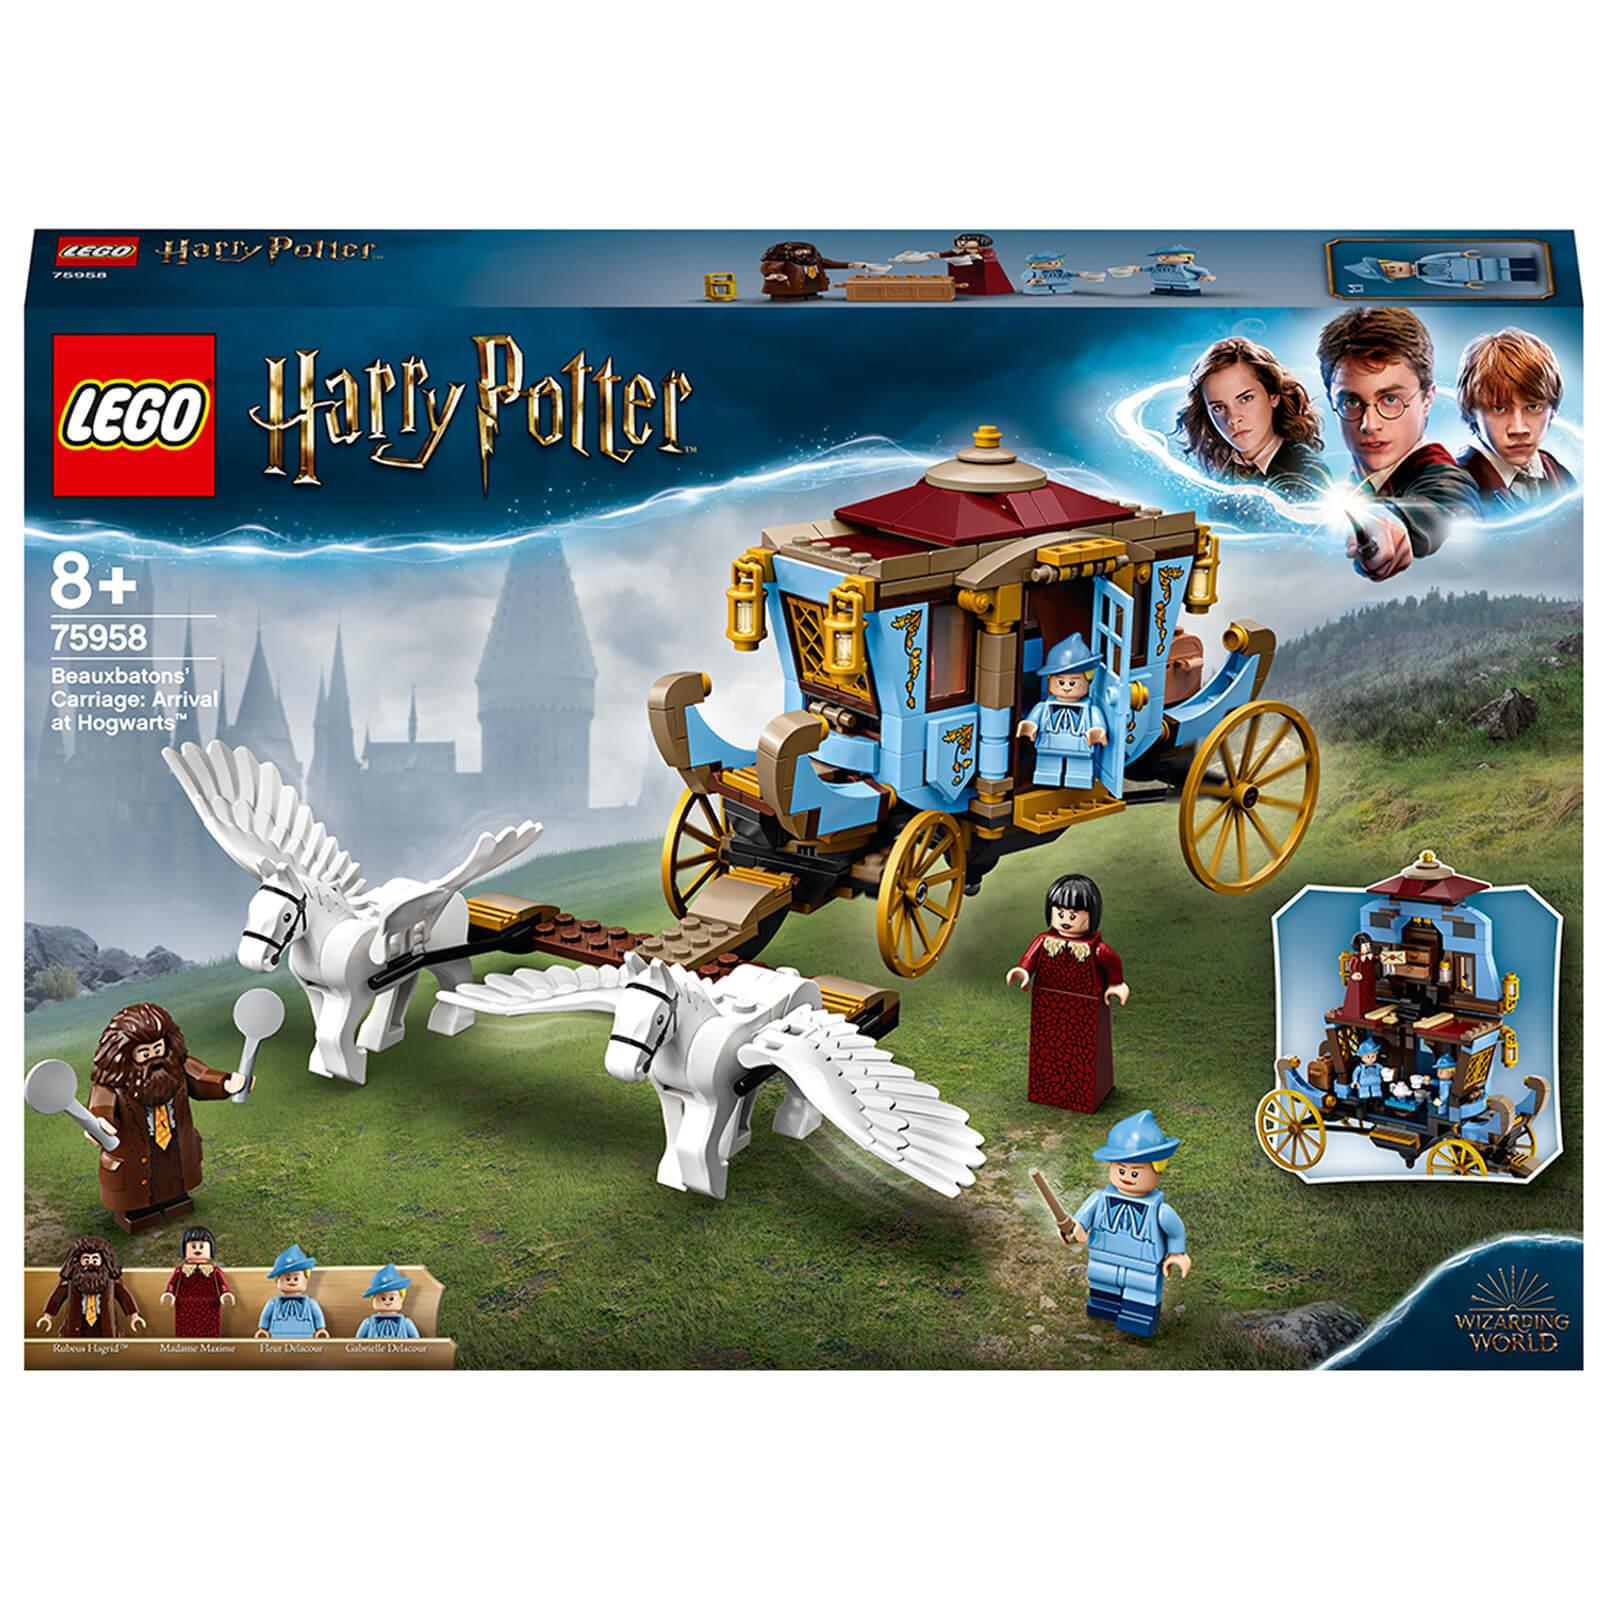 Image of LEGO Harry Potter: Beauxbatons' Carriage at Hogwarts (75958)